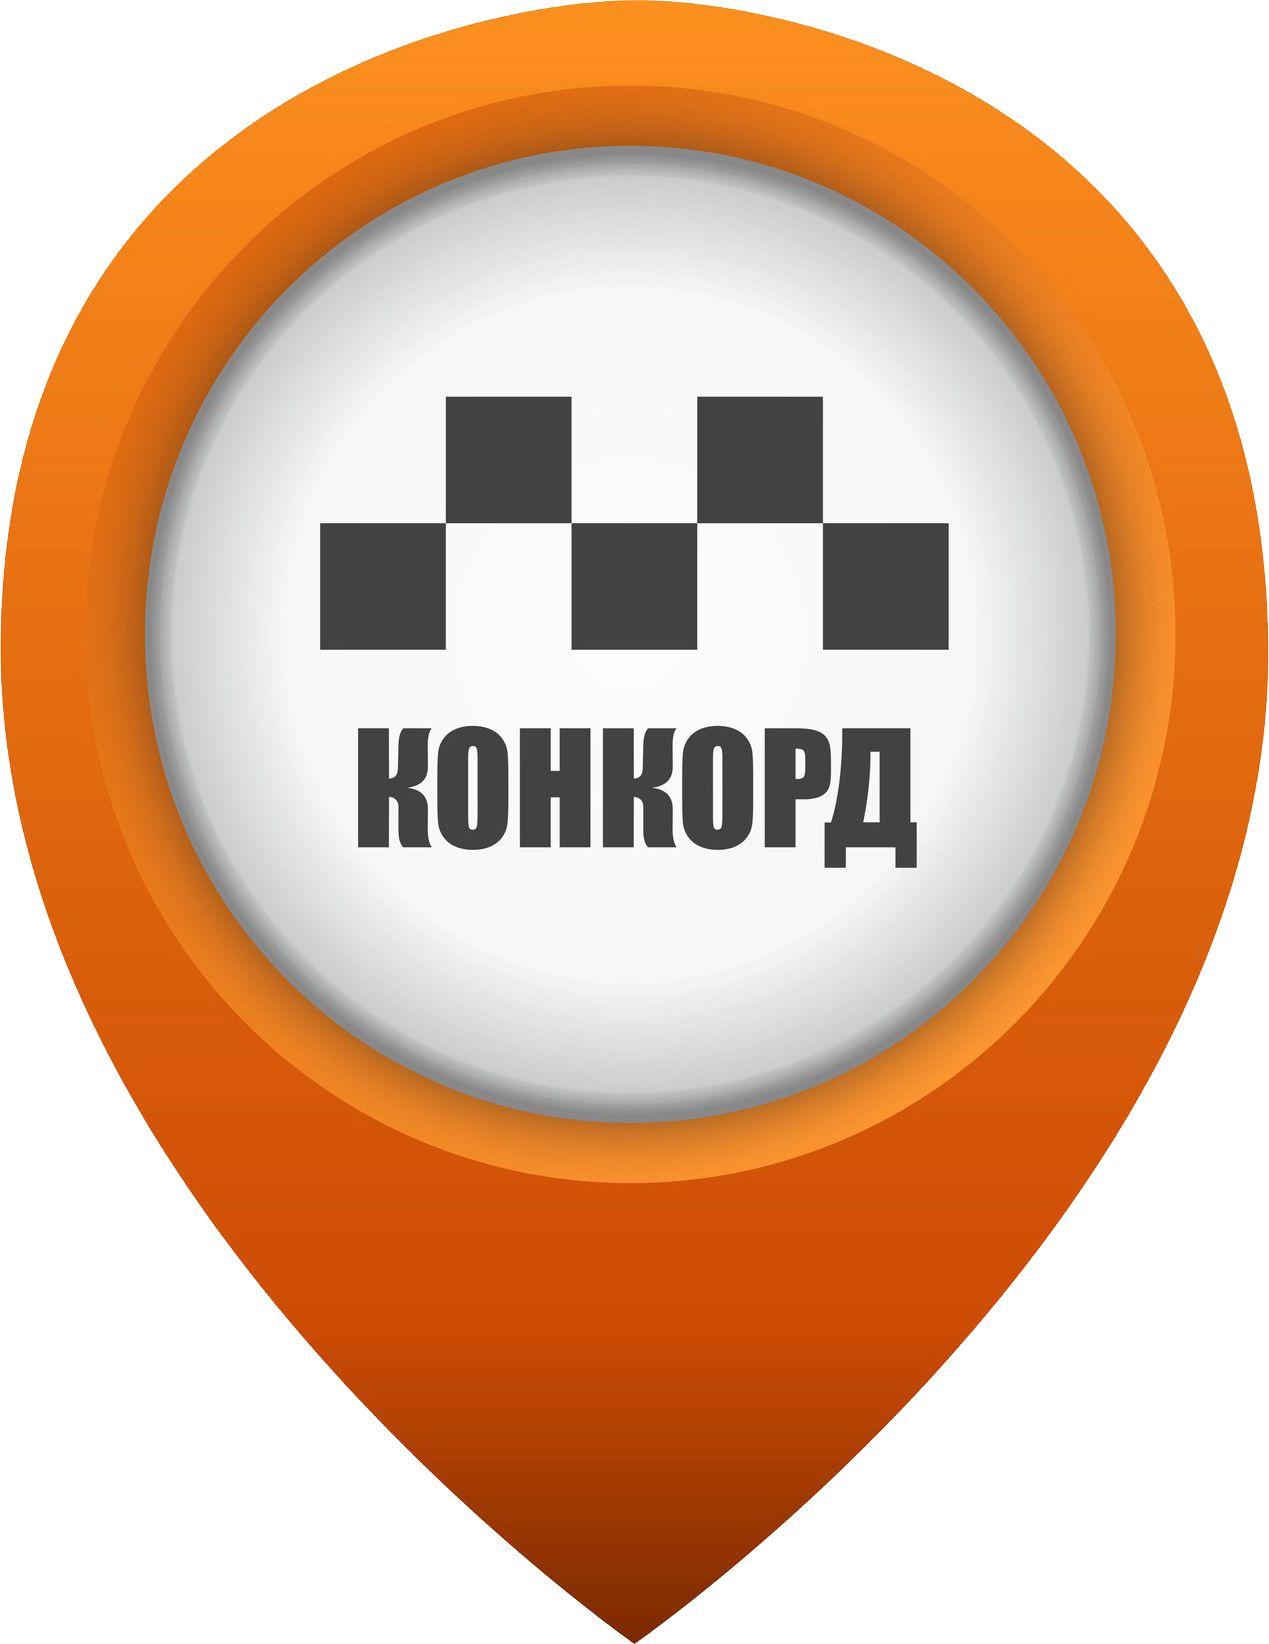 дешевое такси до аэропорта домодедово из люберец